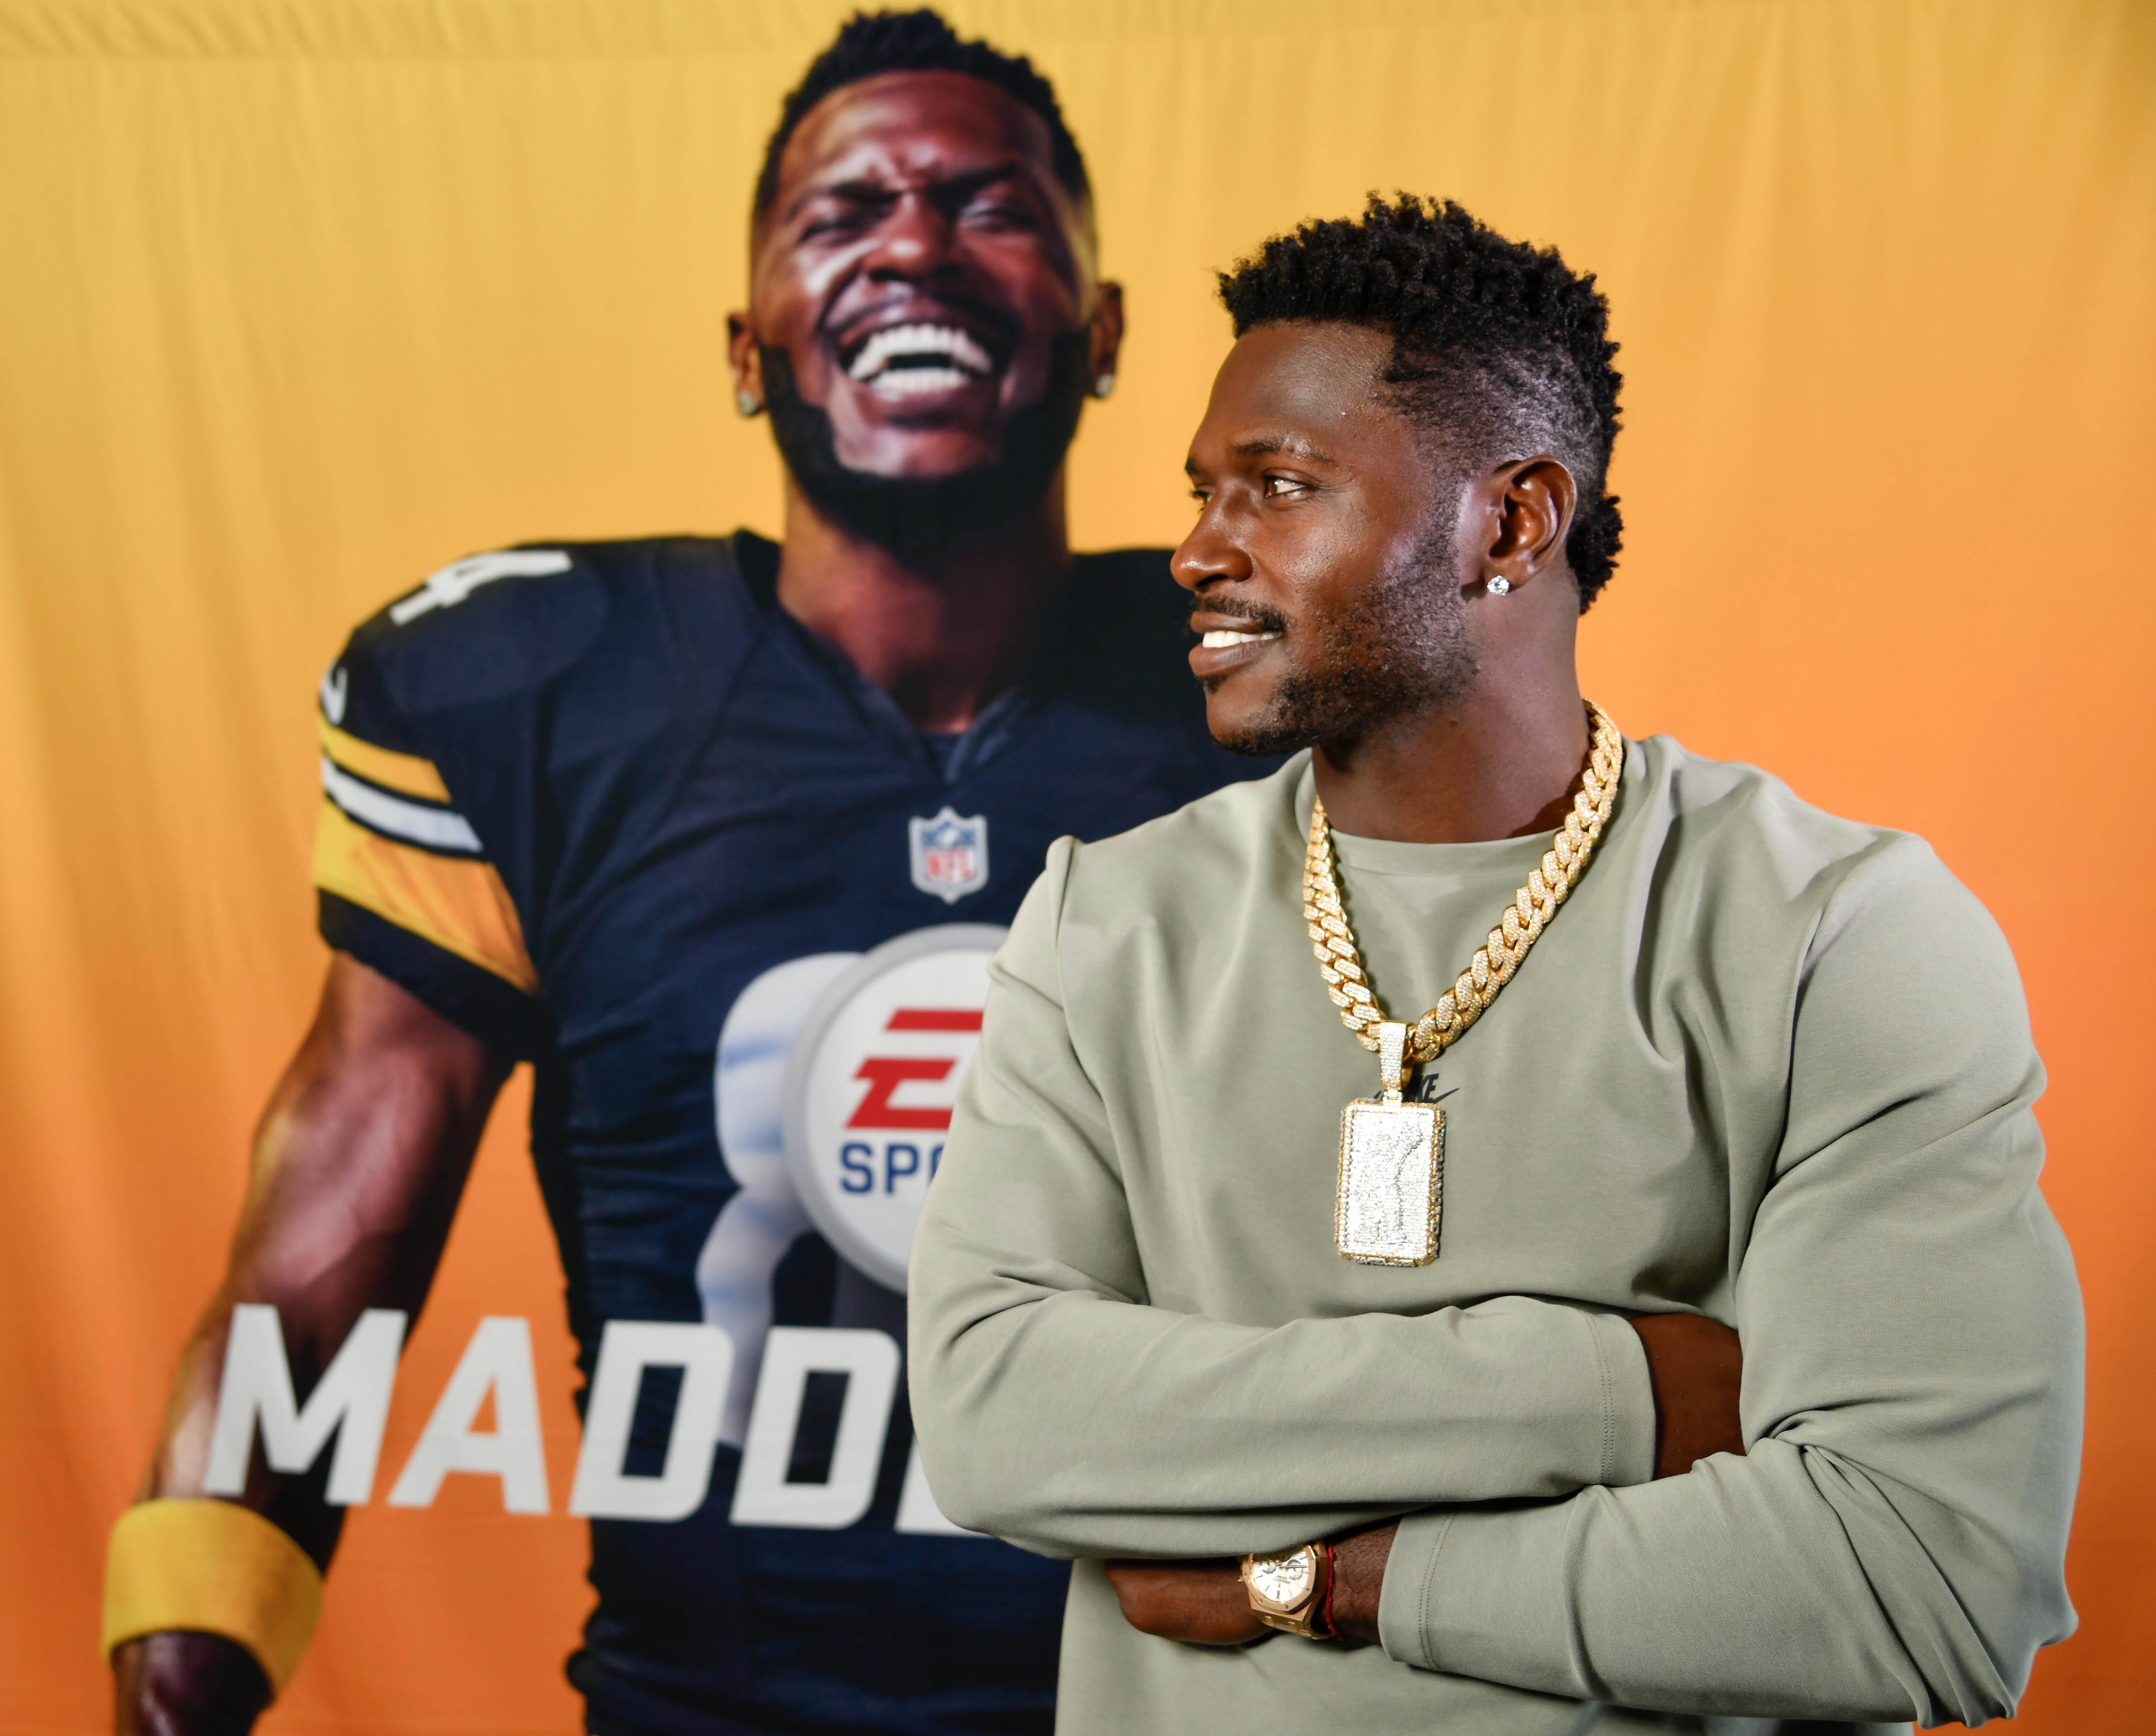 NFL: Antonio Brown-Madden 19 Cover Athlete